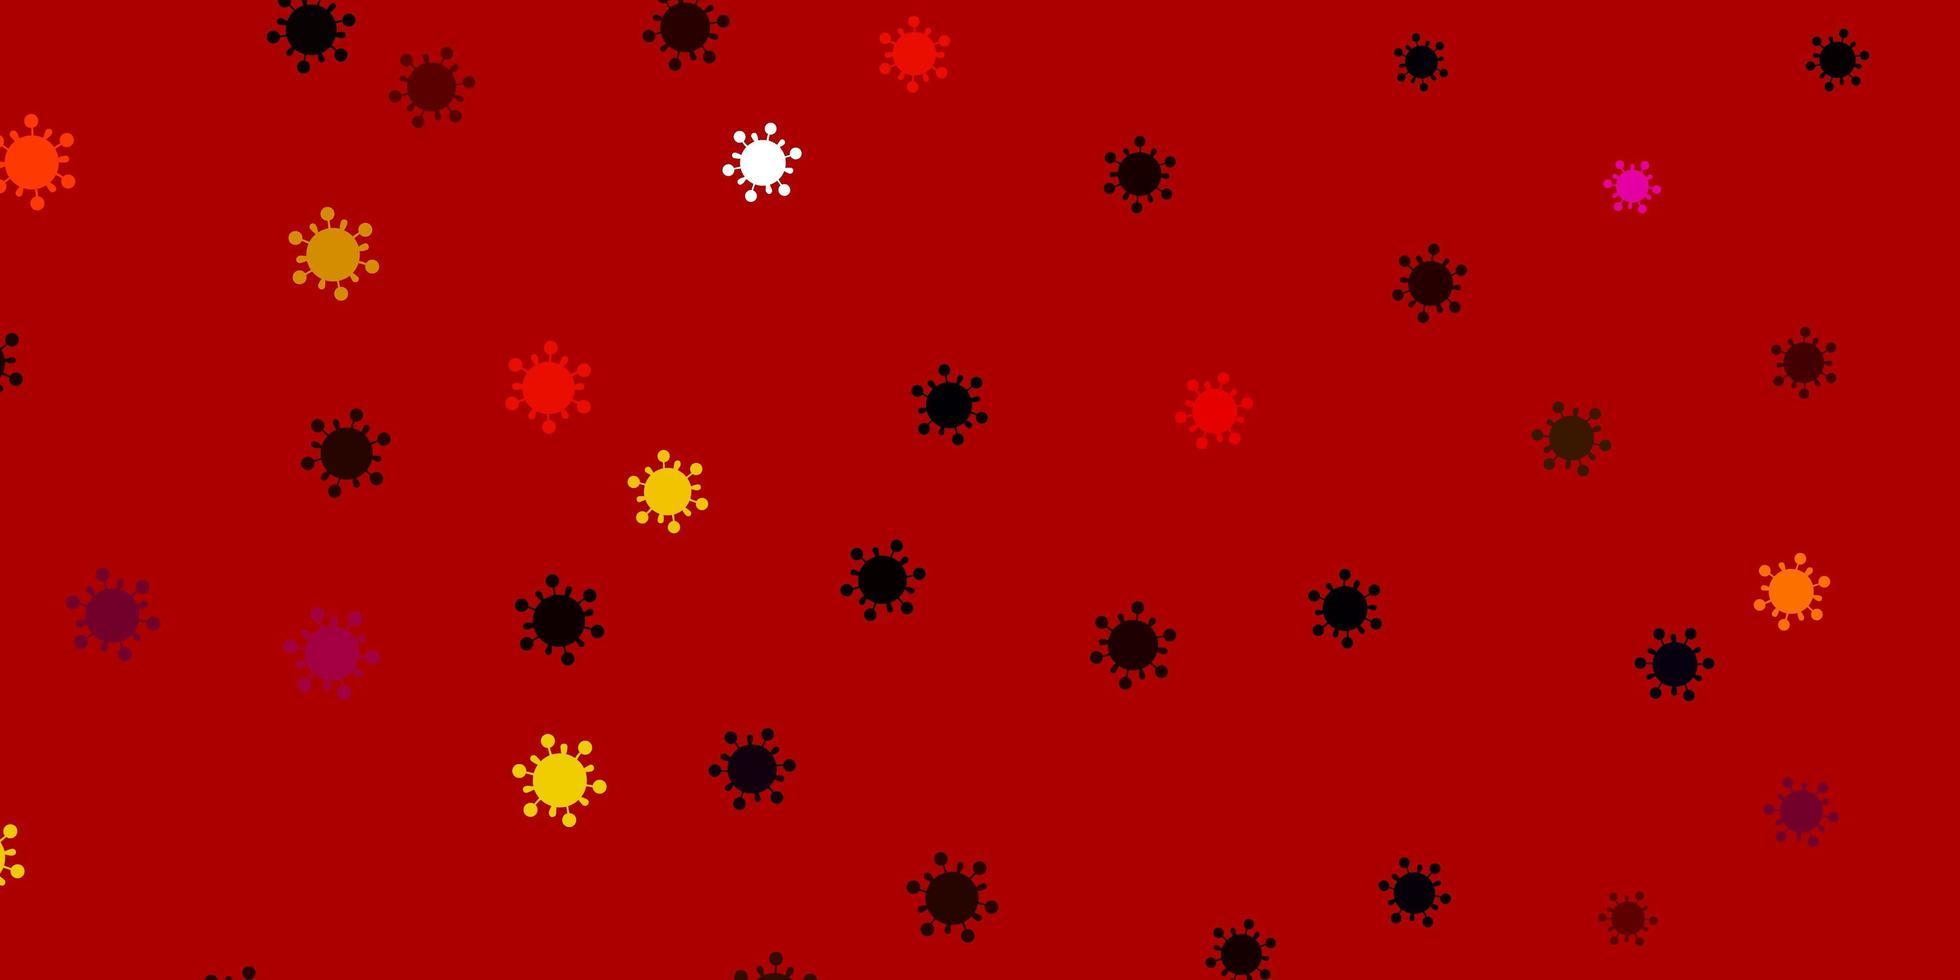 hellrosa, gelber Vektorhintergrund mit covid-19 Symbolen vektor